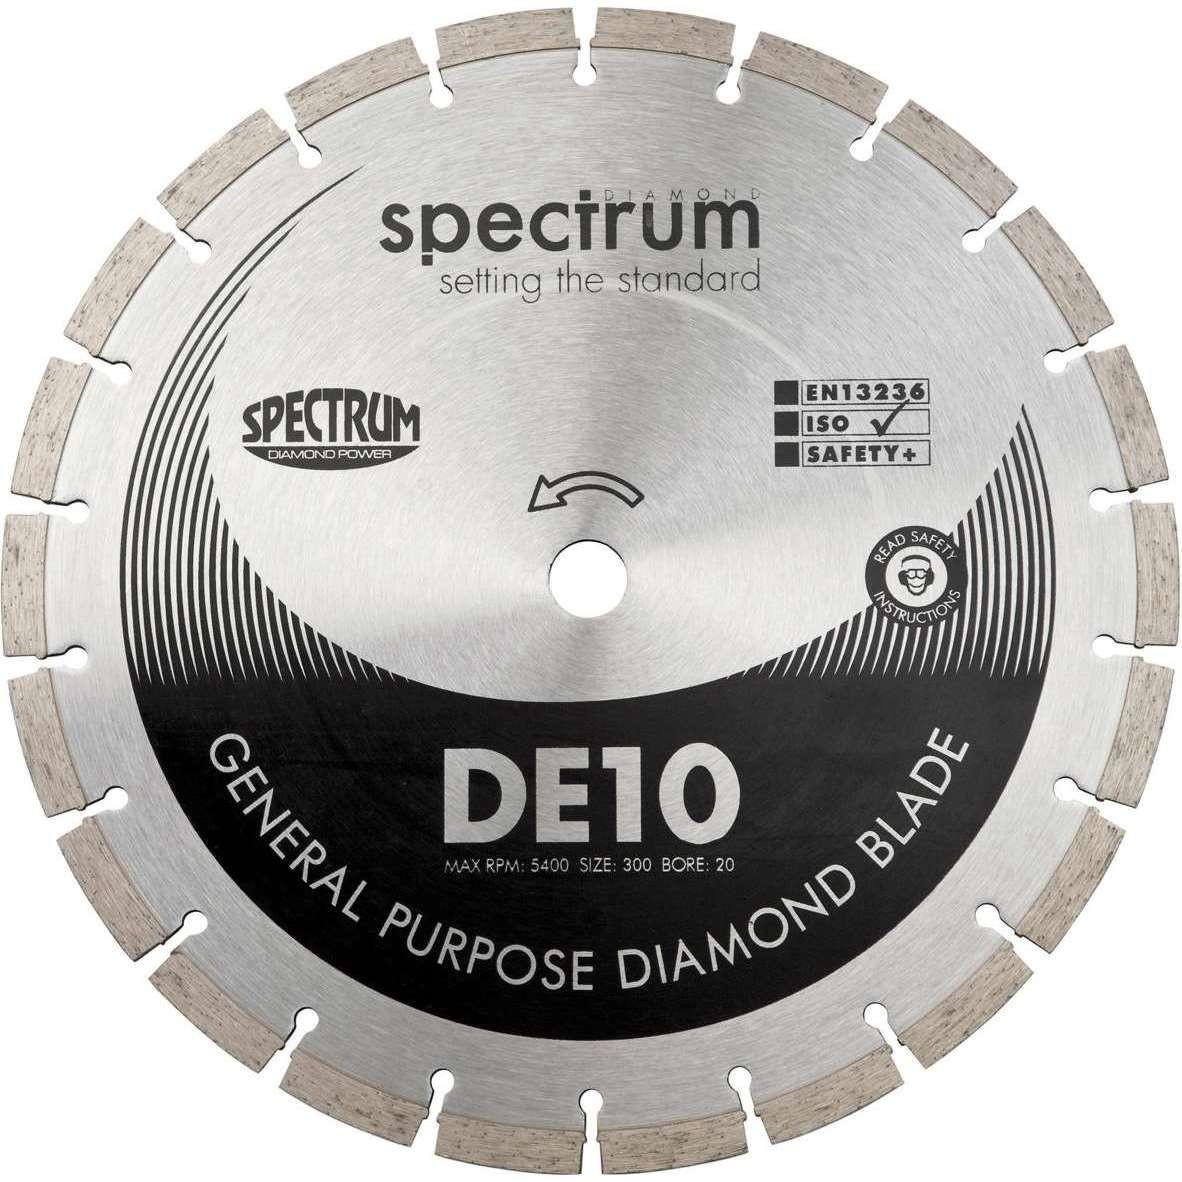 DE10 Standard General Purpose Diamond Blade